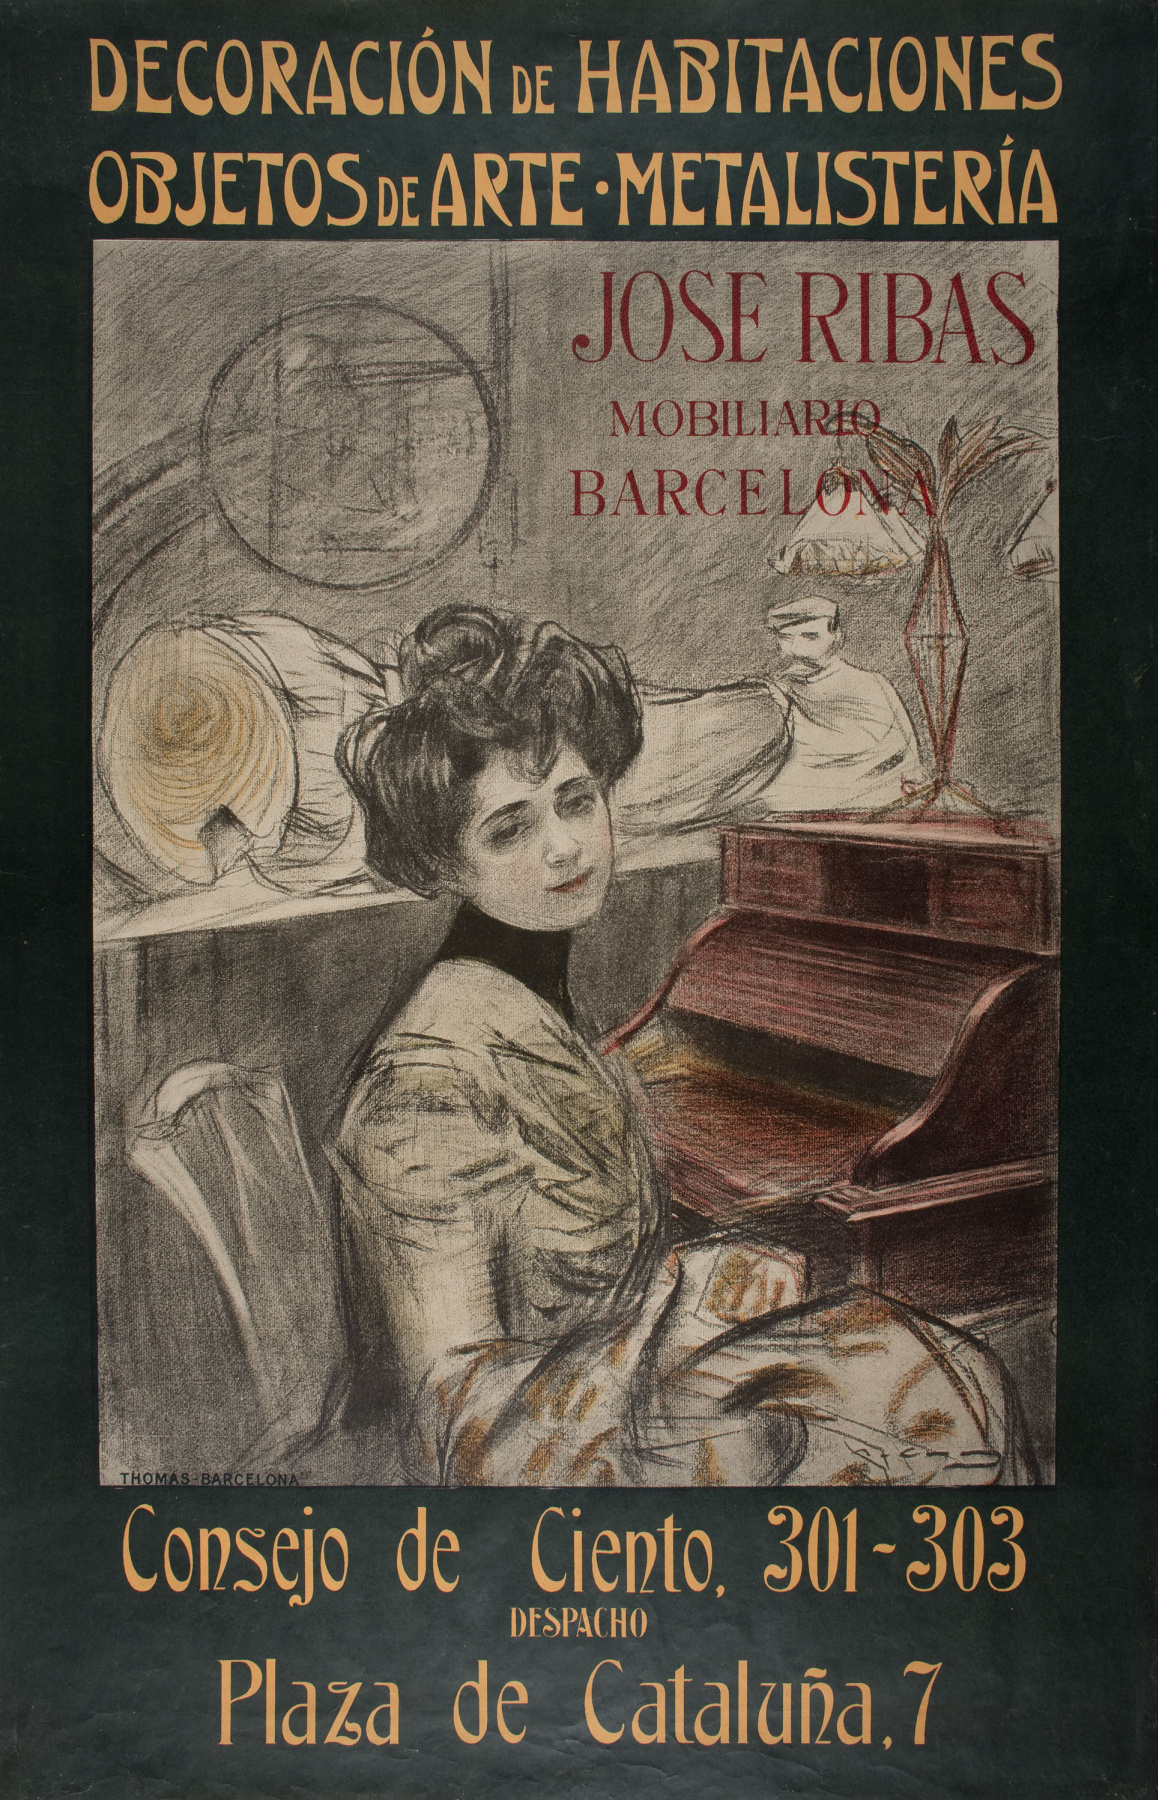 Ramon Casas i Carbó. Furniture advertisements by Jose Ribas, Barcelona